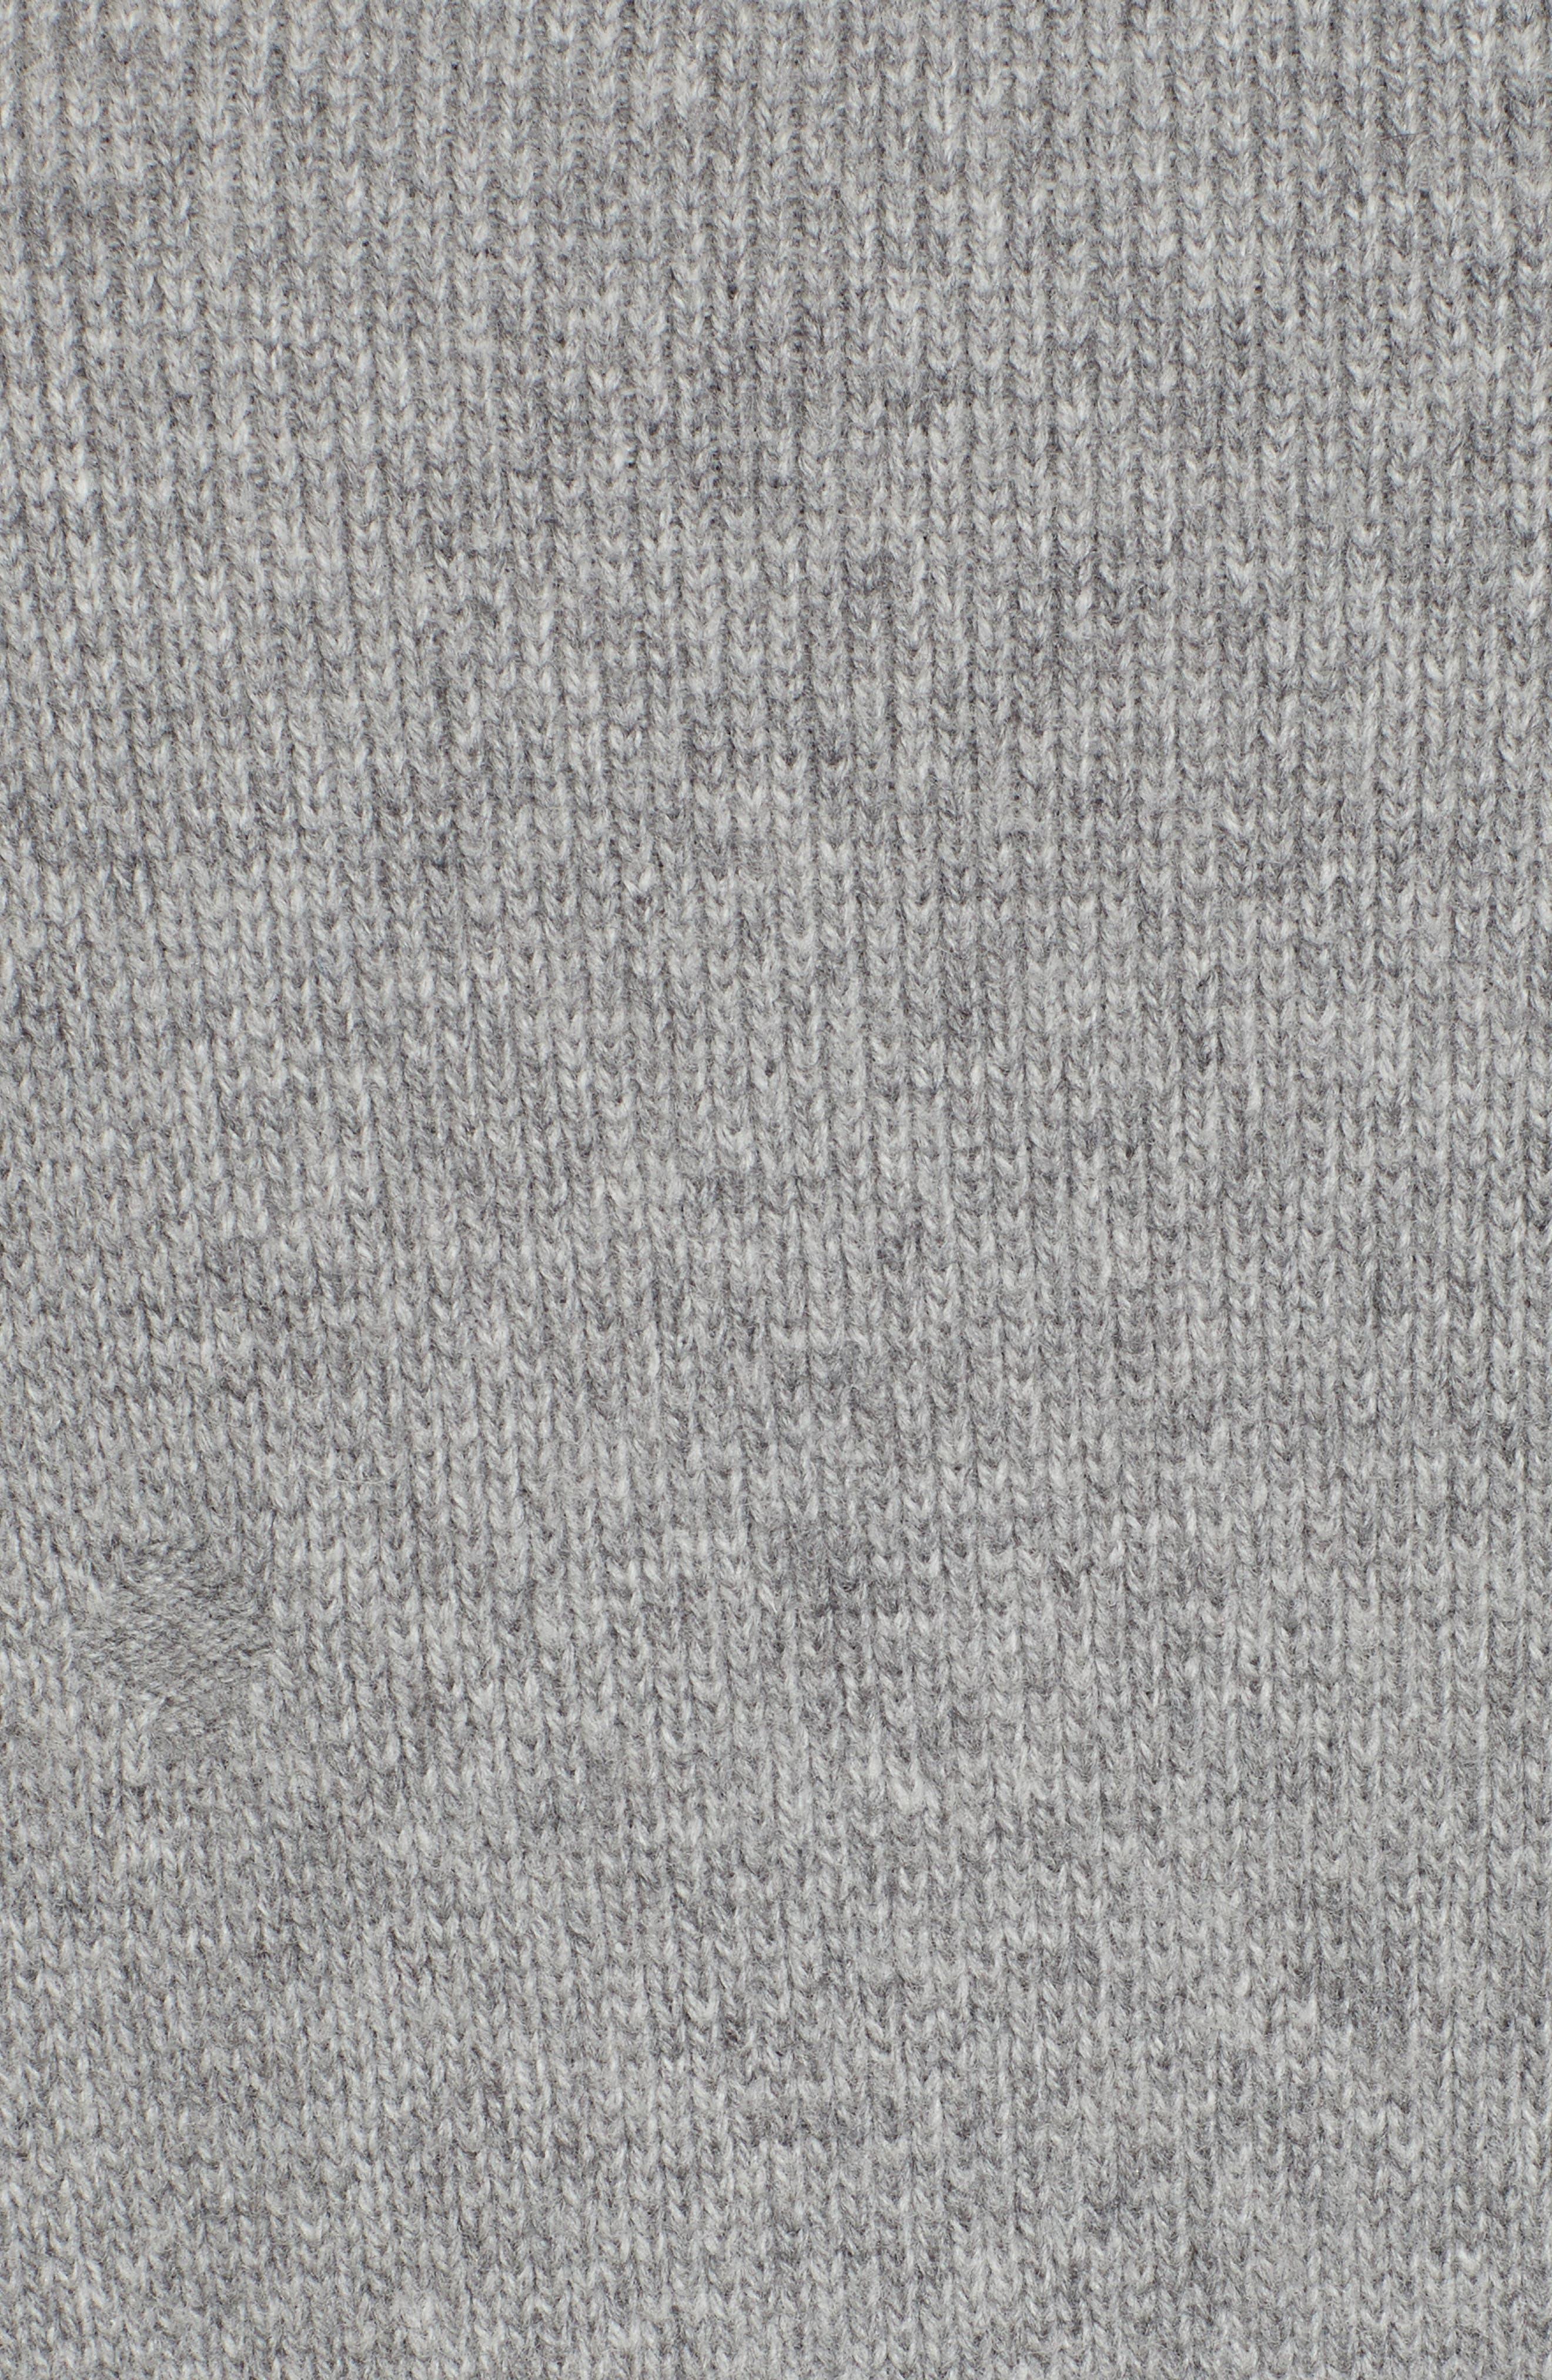 Concrete Wool Turtleneck Sweater,                             Alternate thumbnail 5, color,                             050